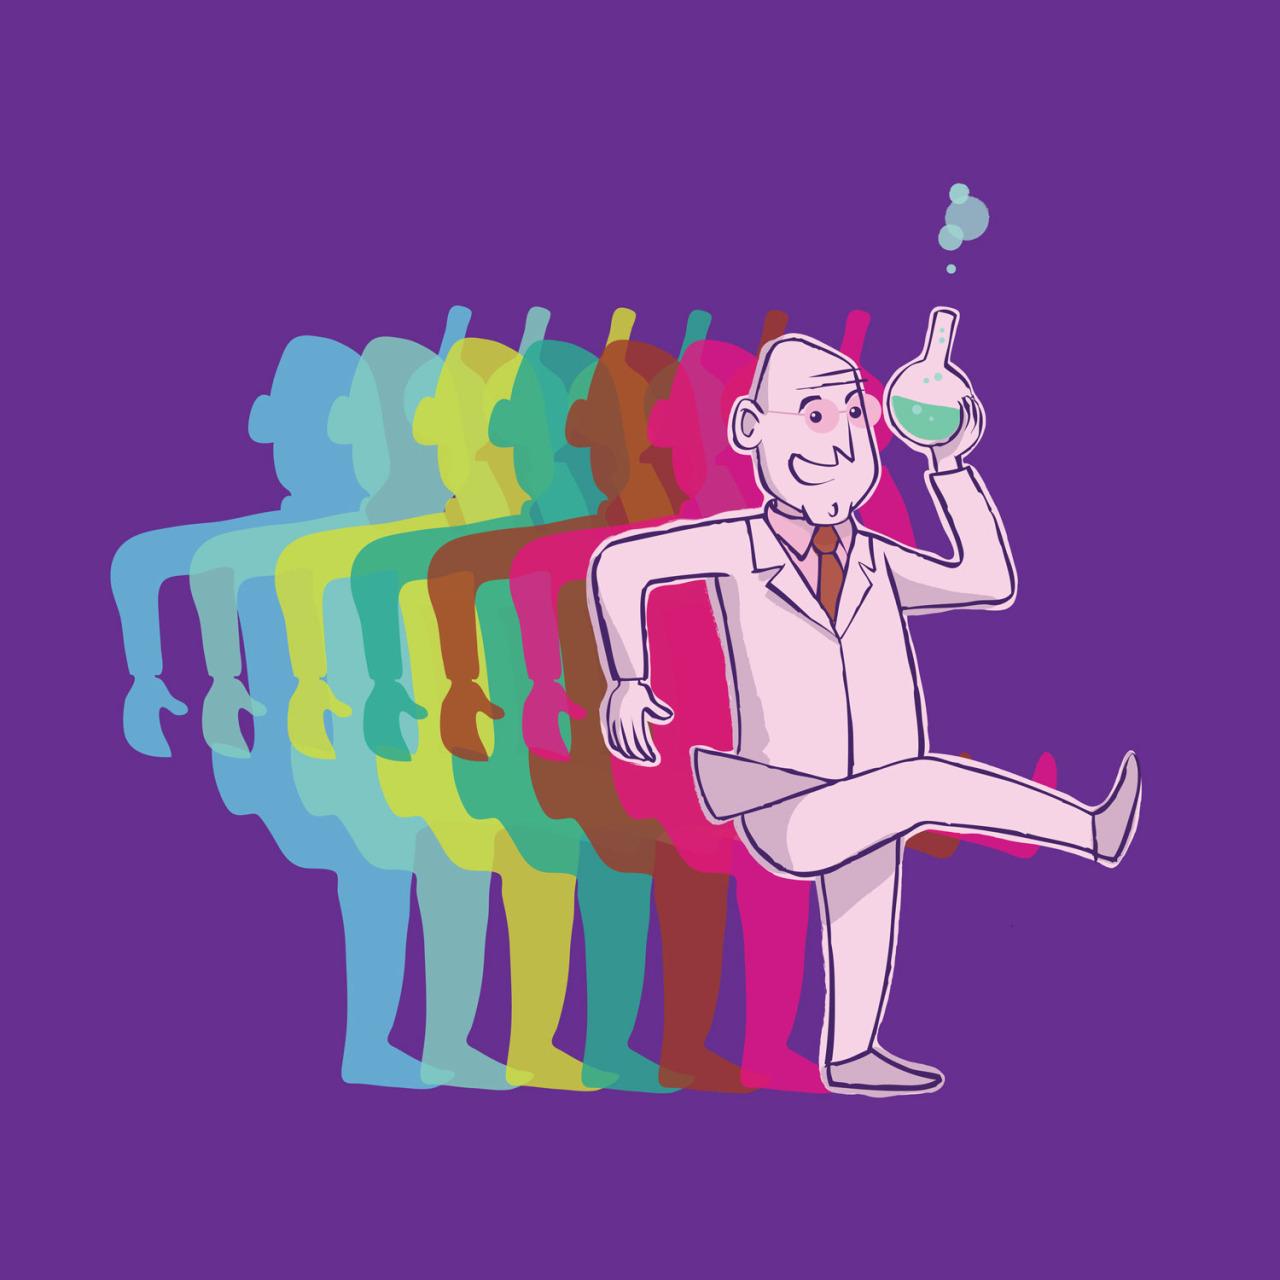 1938, il dott. Albert Hofmann sintetizza l'LSD (© Nicola Ferrarese)